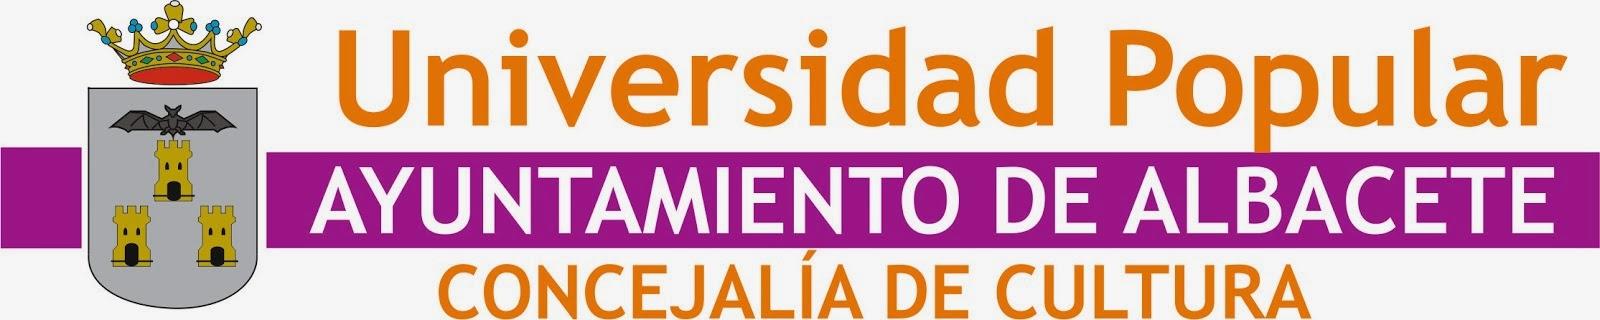 UniversidadPopularAlbacete